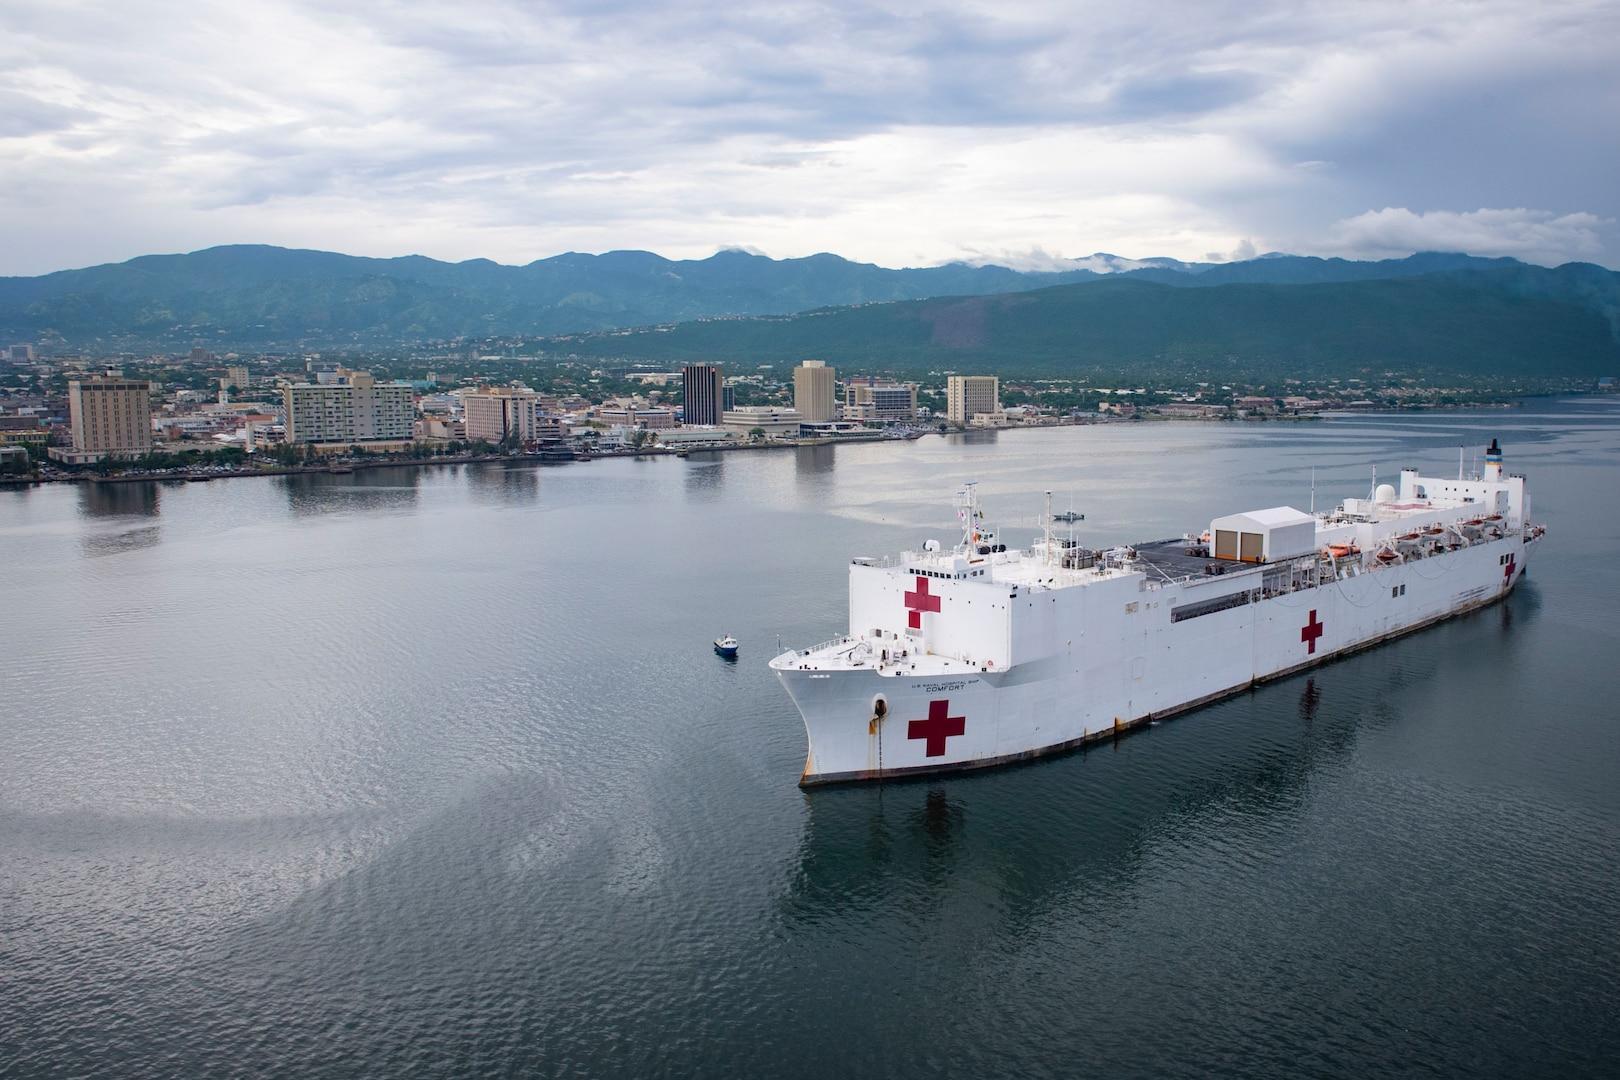 USNS Comfort anchored off the coast of Kingston, Jamaica.